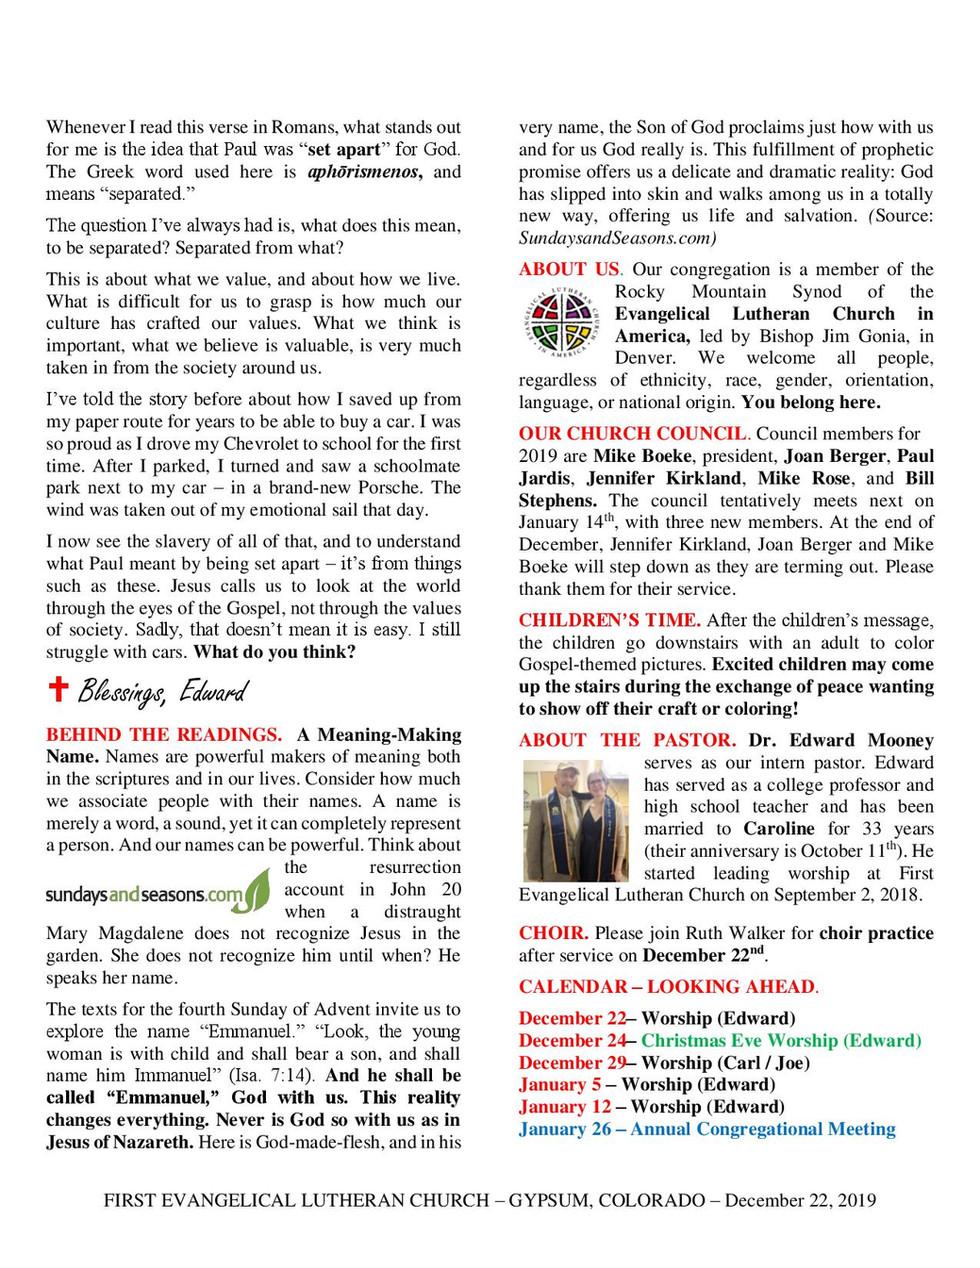 Newsletter, December 22, 2019, page 2